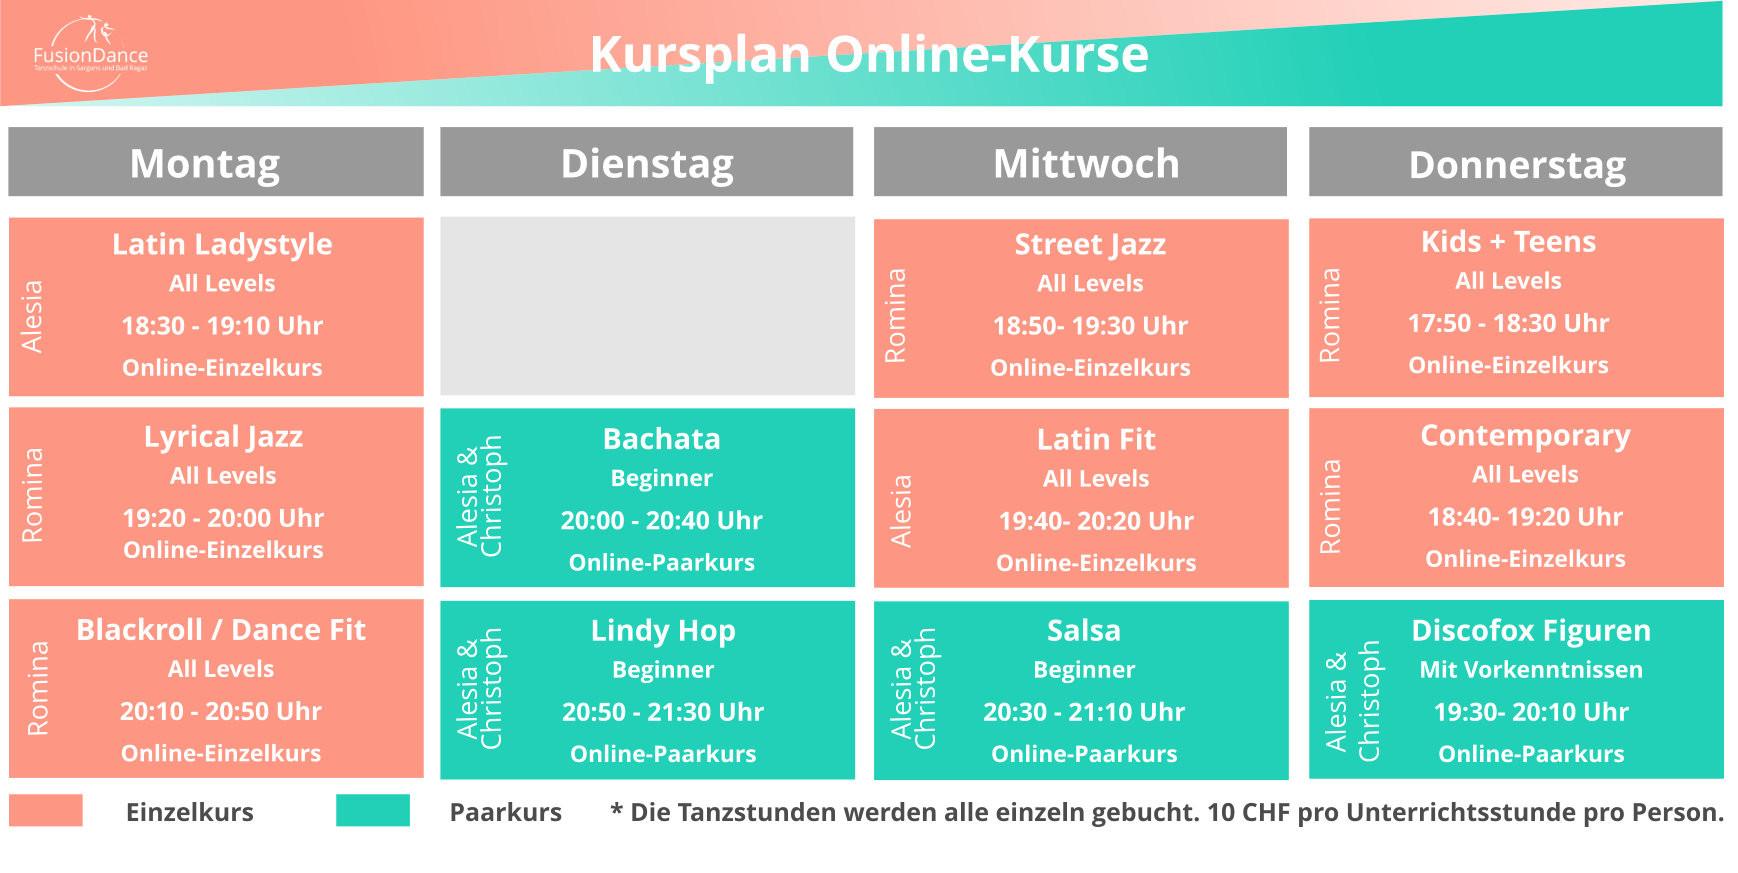 Kursplan FusionDance online.jpg